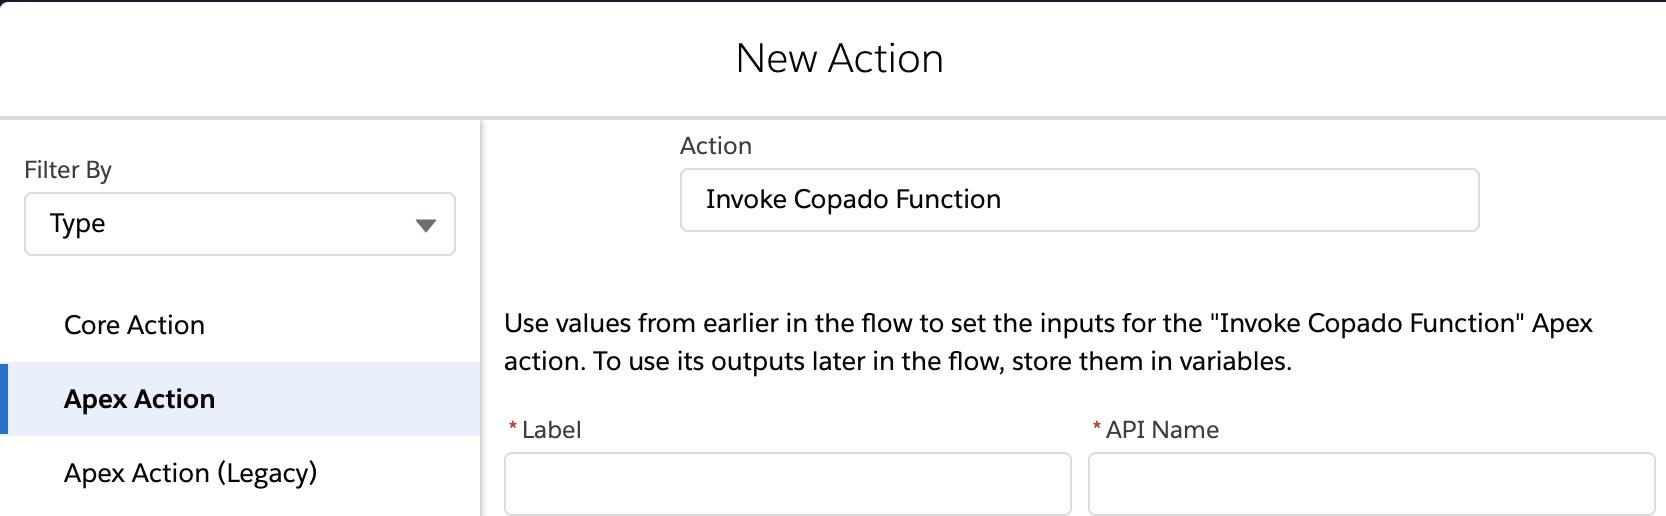 Invoke Copado Function